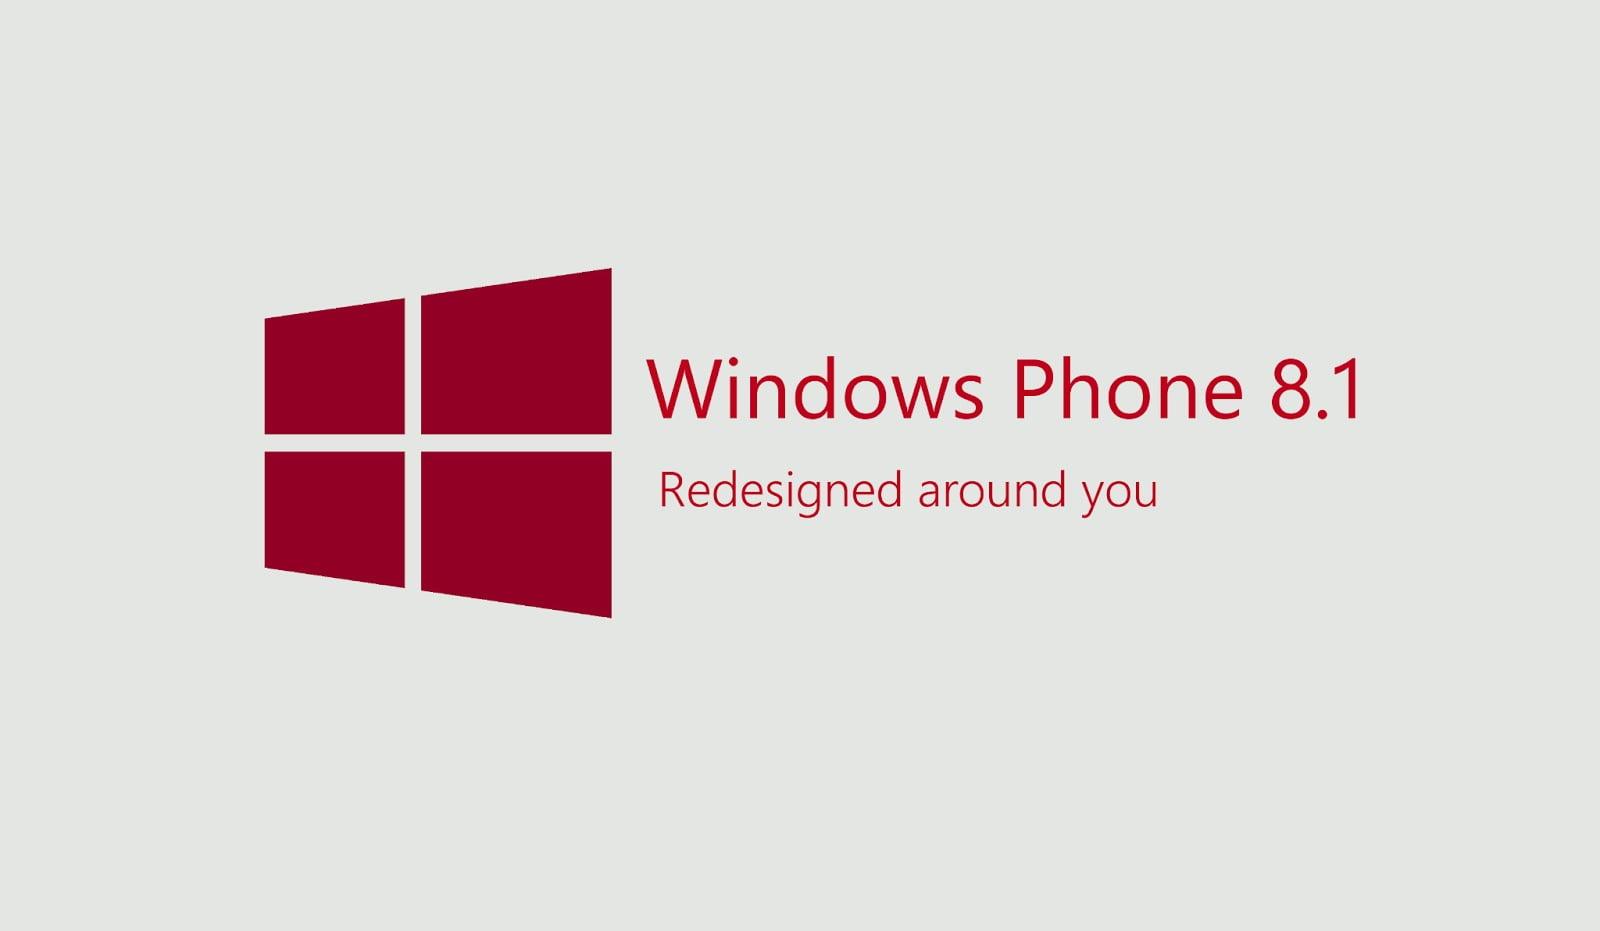 Logo de Windows Phone 8.1, rediseñado a tu alrededor